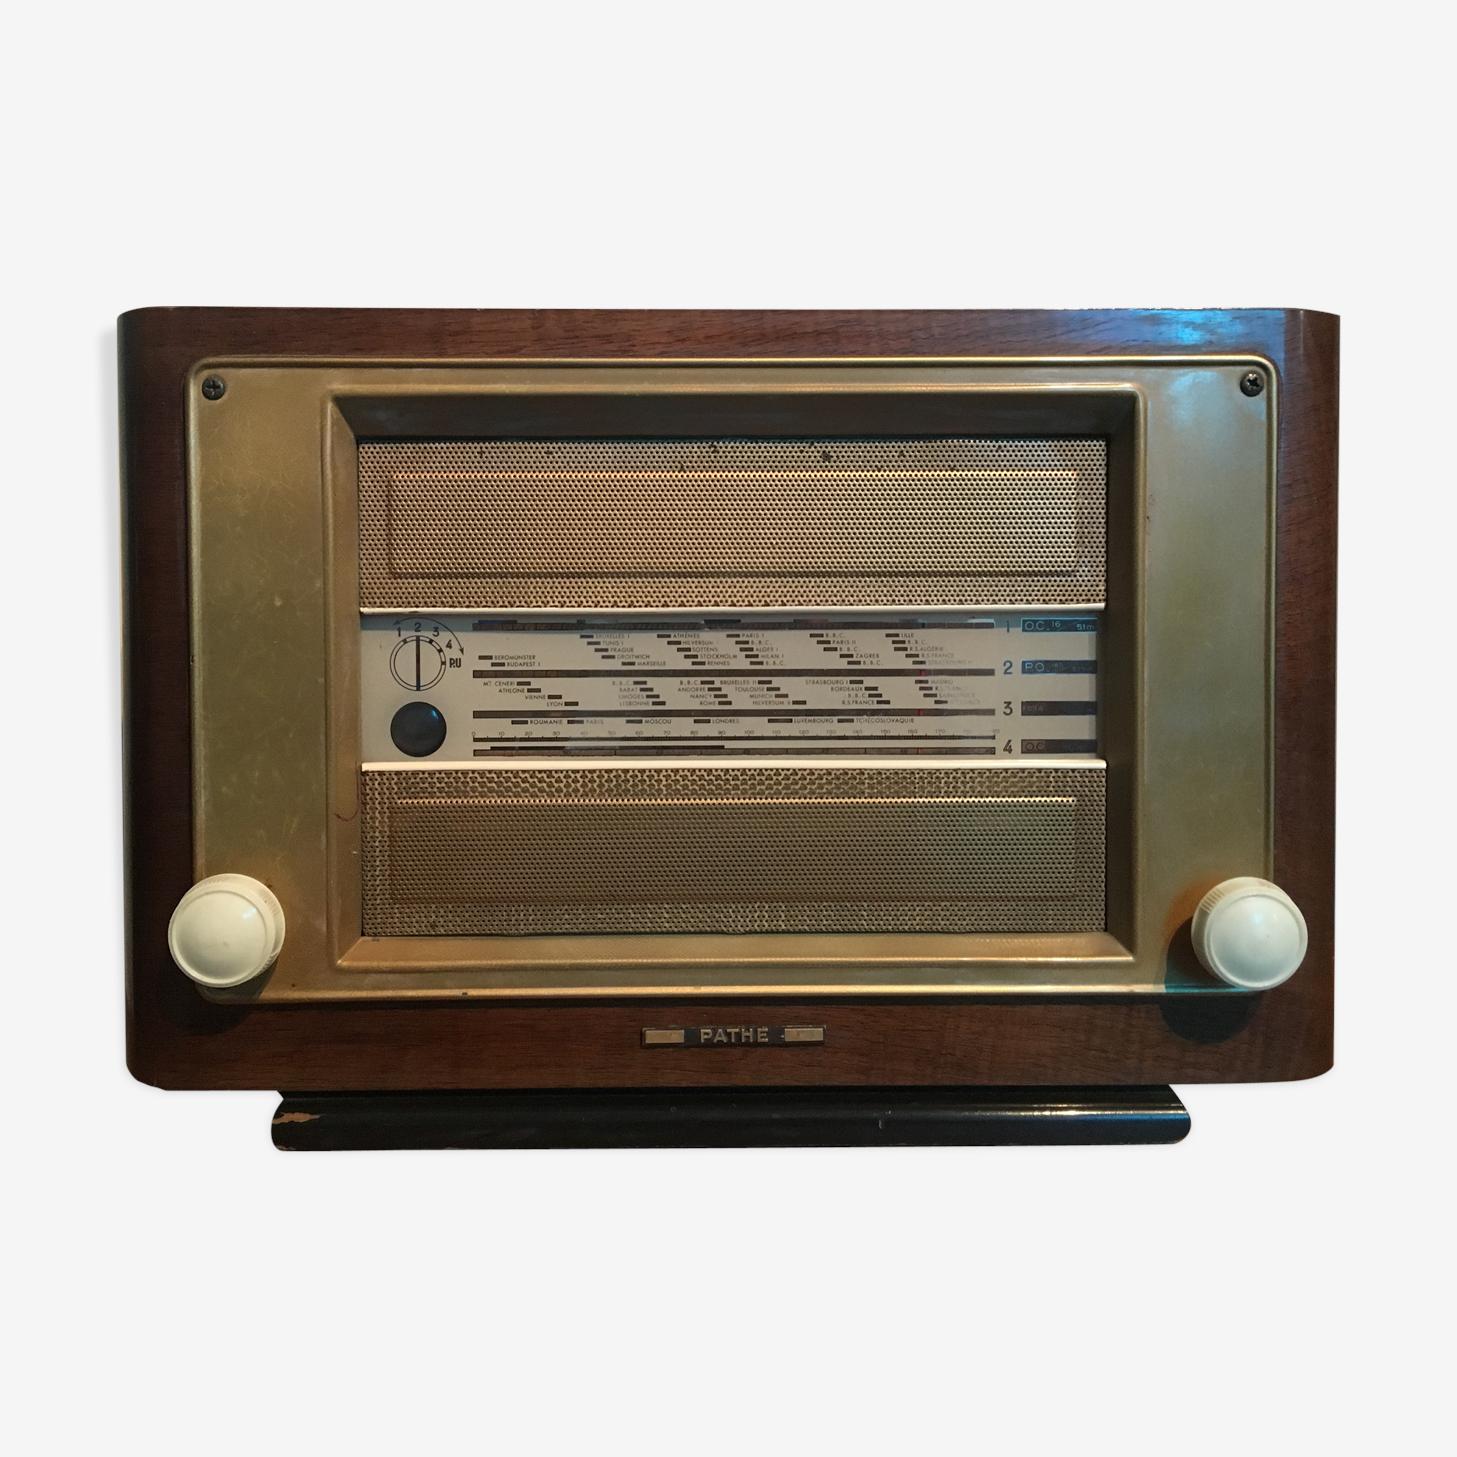 Poste radio pathé modèle 551